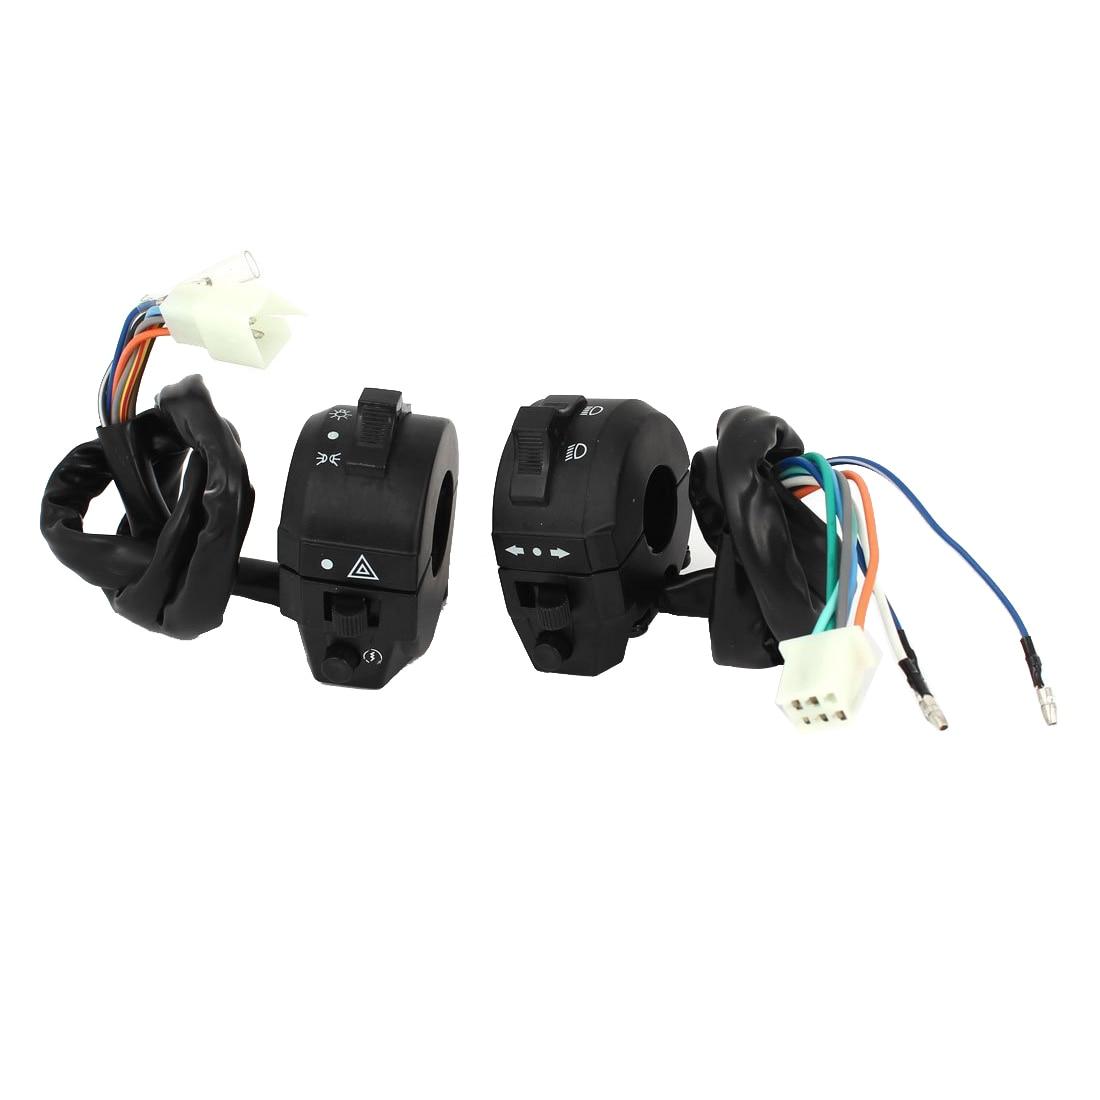 купить Promotion! Motorcycle ATV Handlebar Horn Turn Signal Headlight Electrical Switch недорого